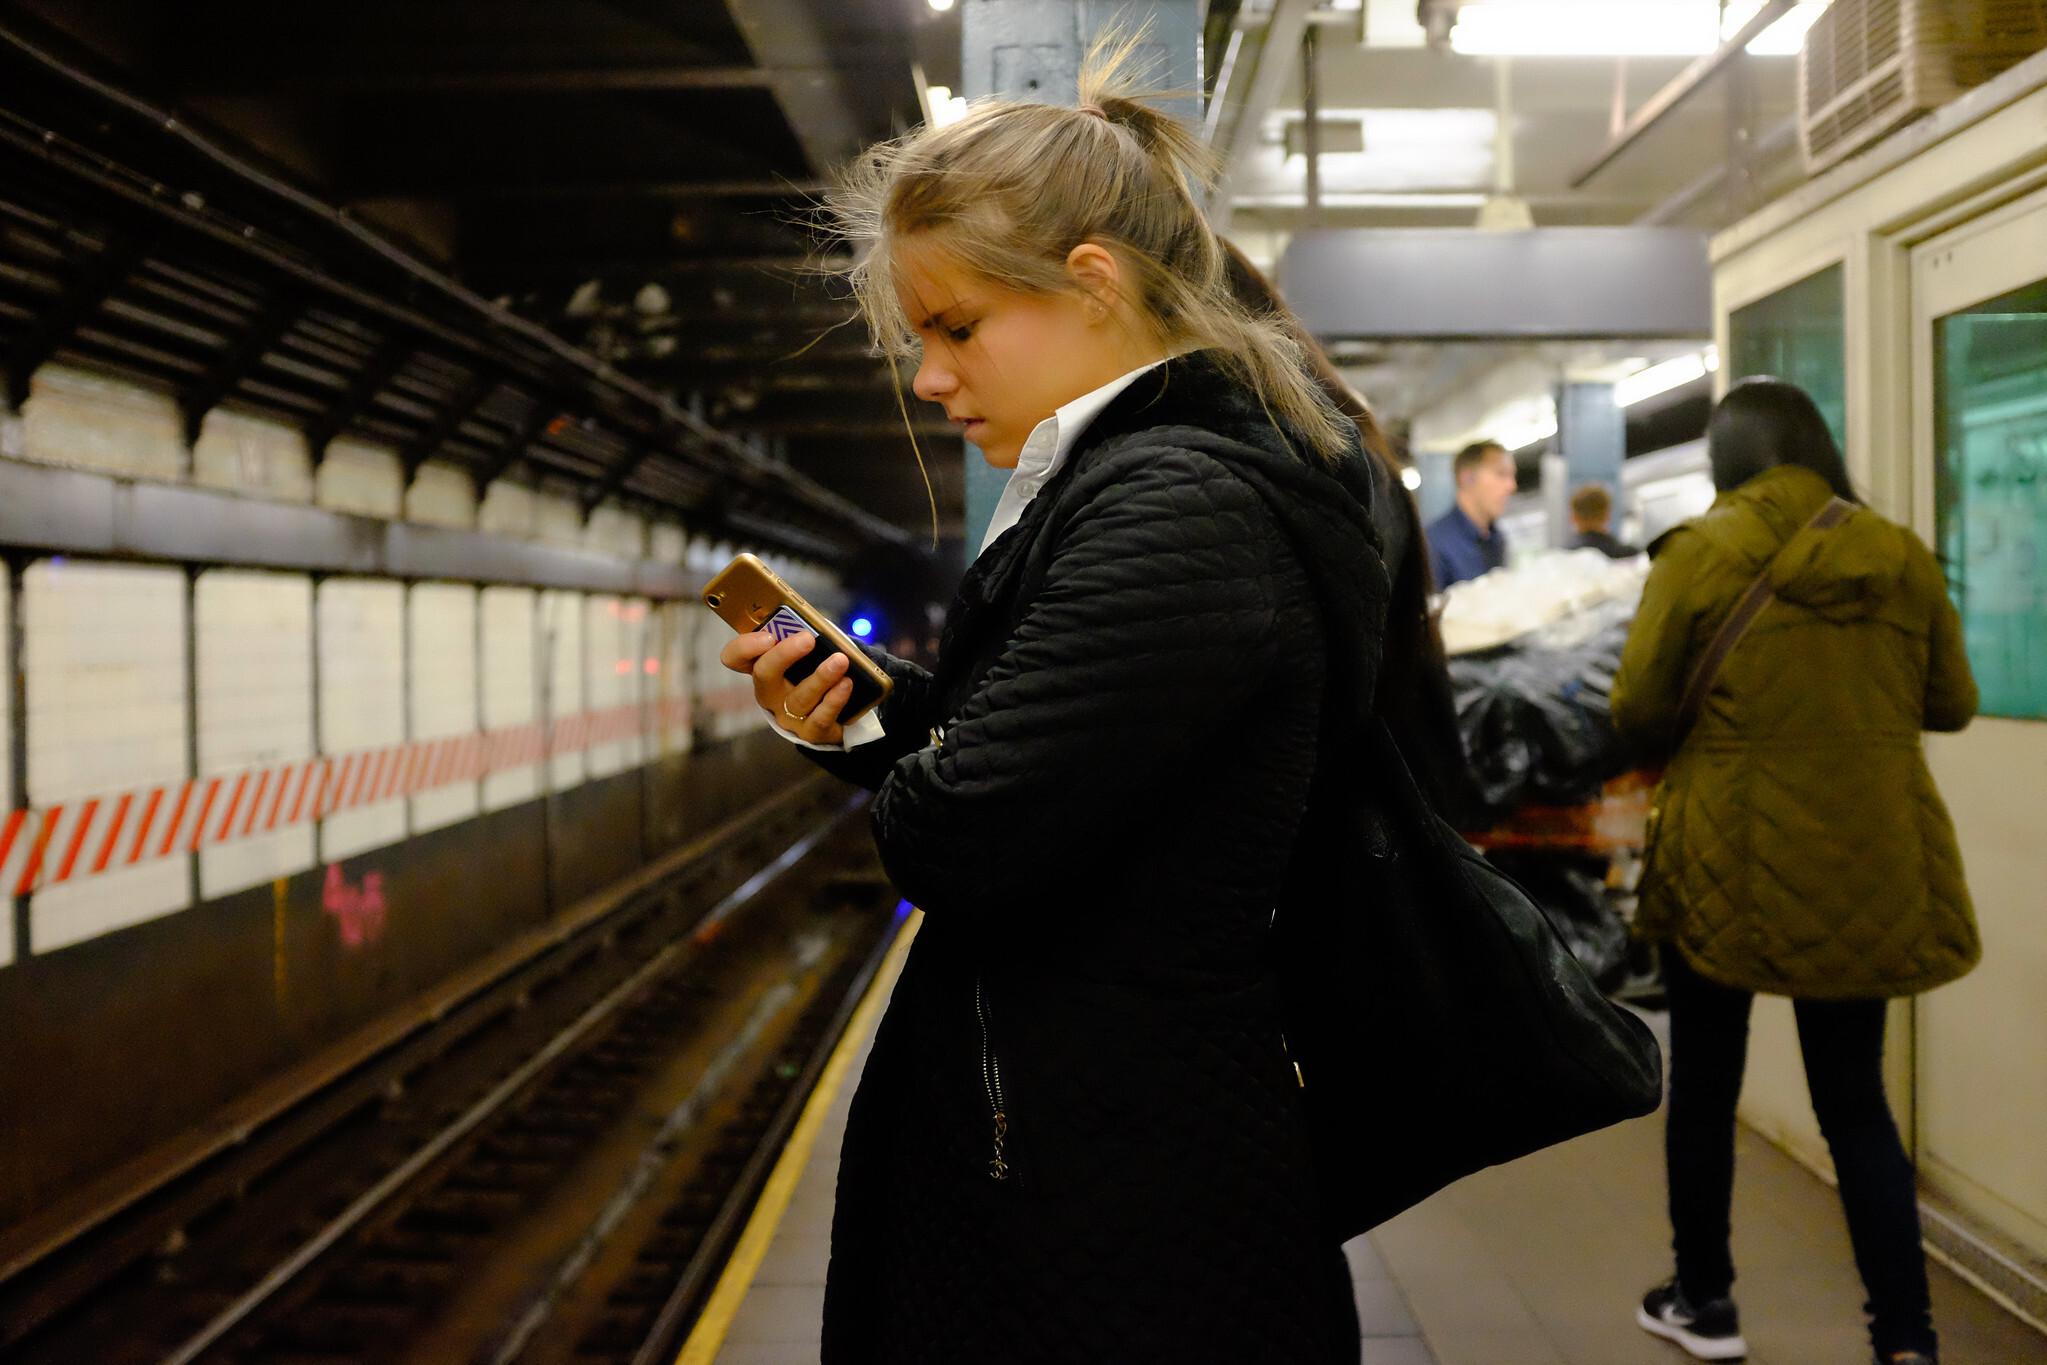 Subway Wi-Fi is nothing more than a sick joke